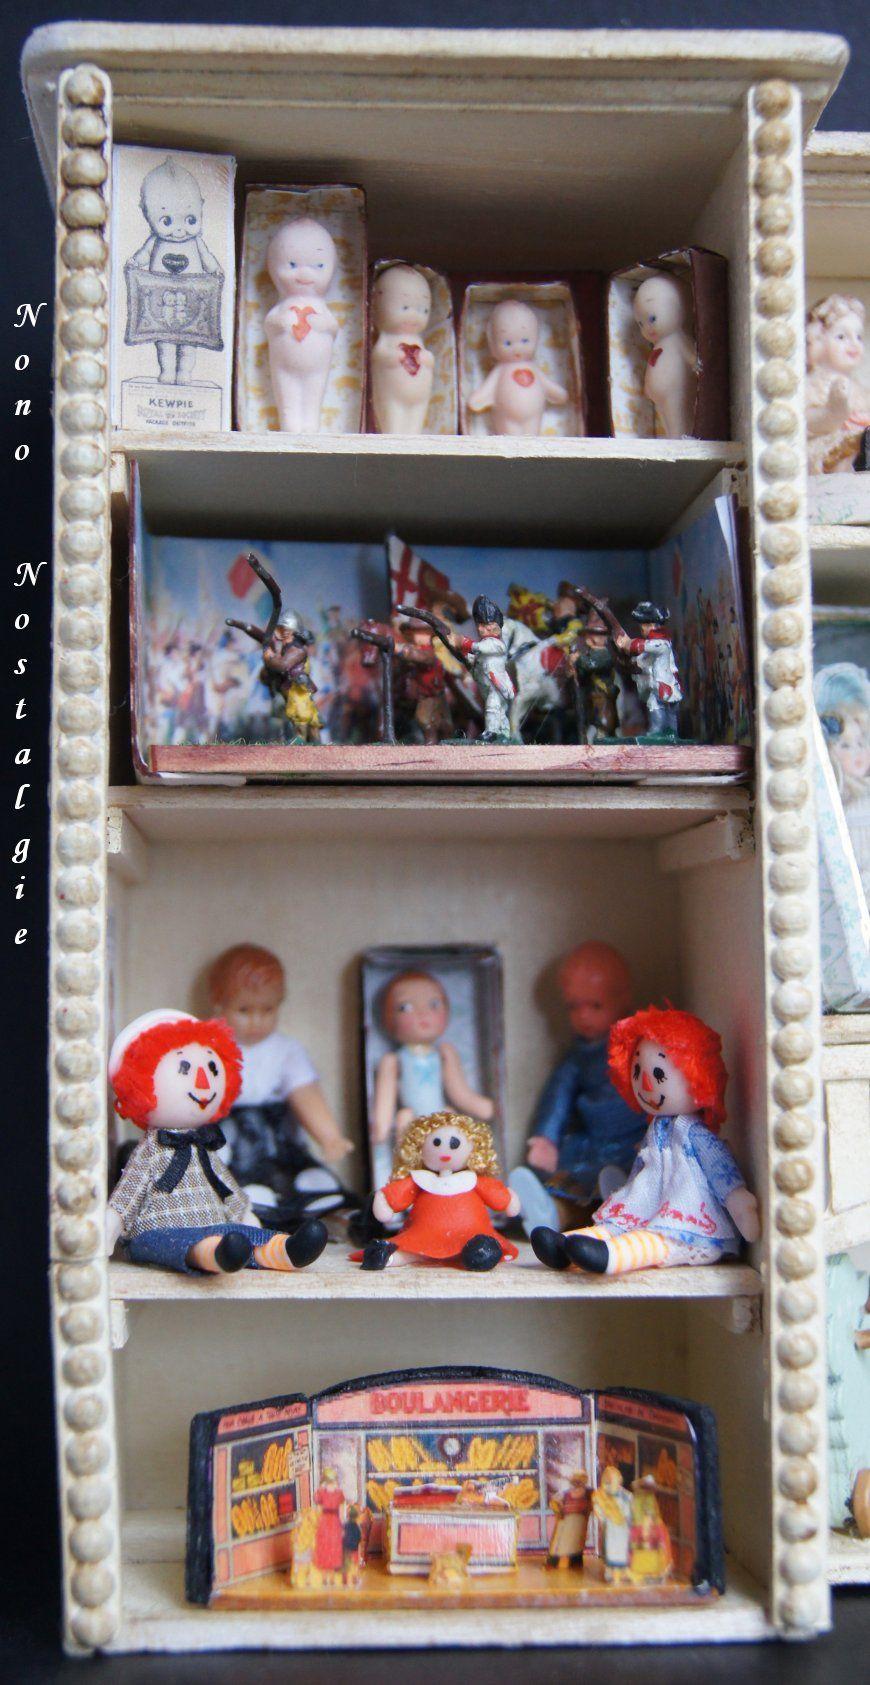 The Nutcracker  toyshop. Close up shelf 1 floor